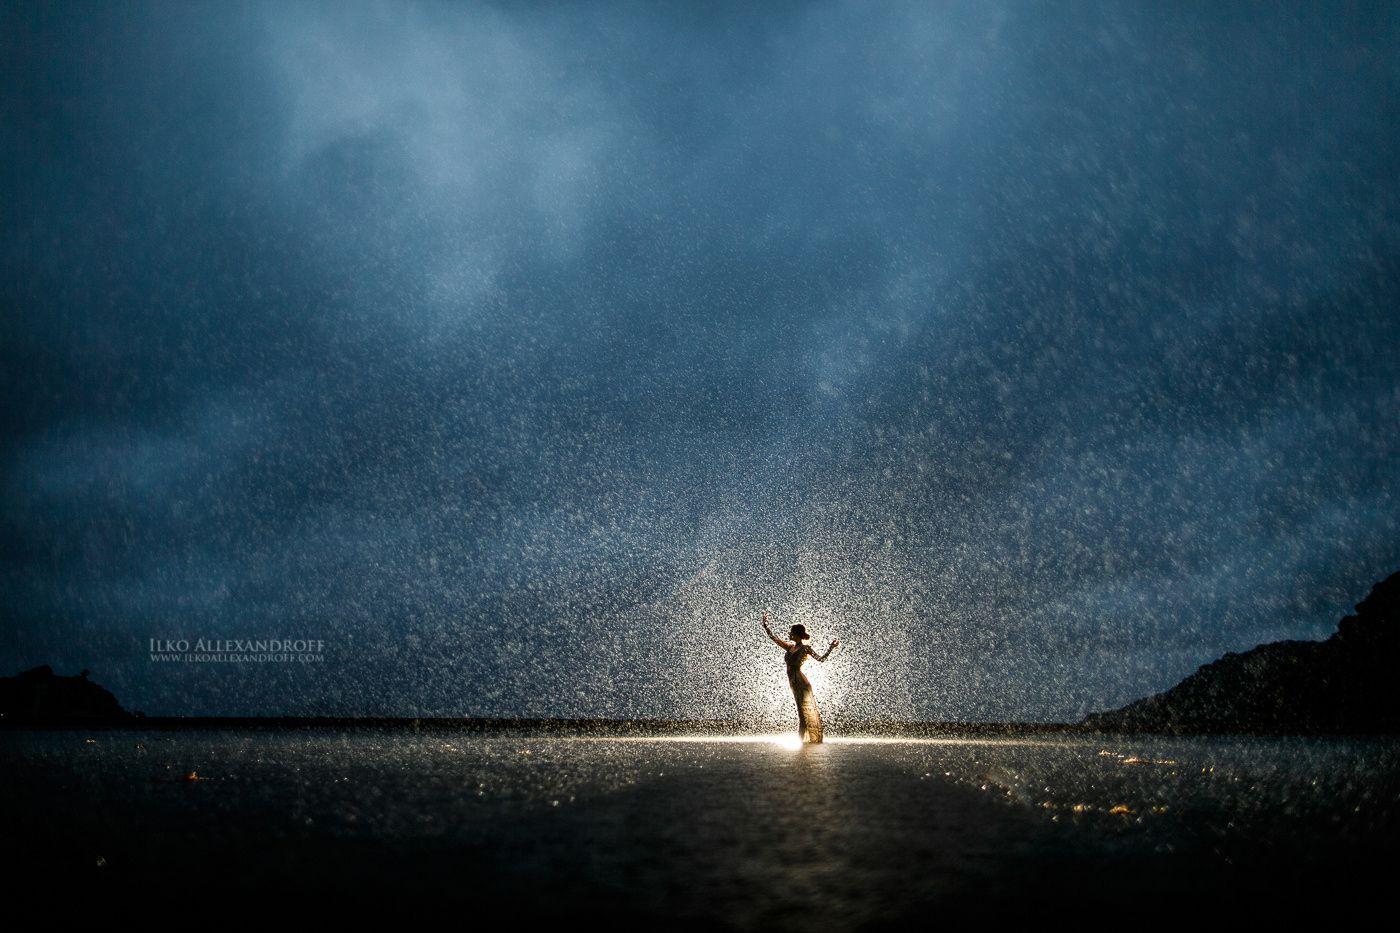 Photo Rainy Silhouette by Ilko Allexandroff on 500px